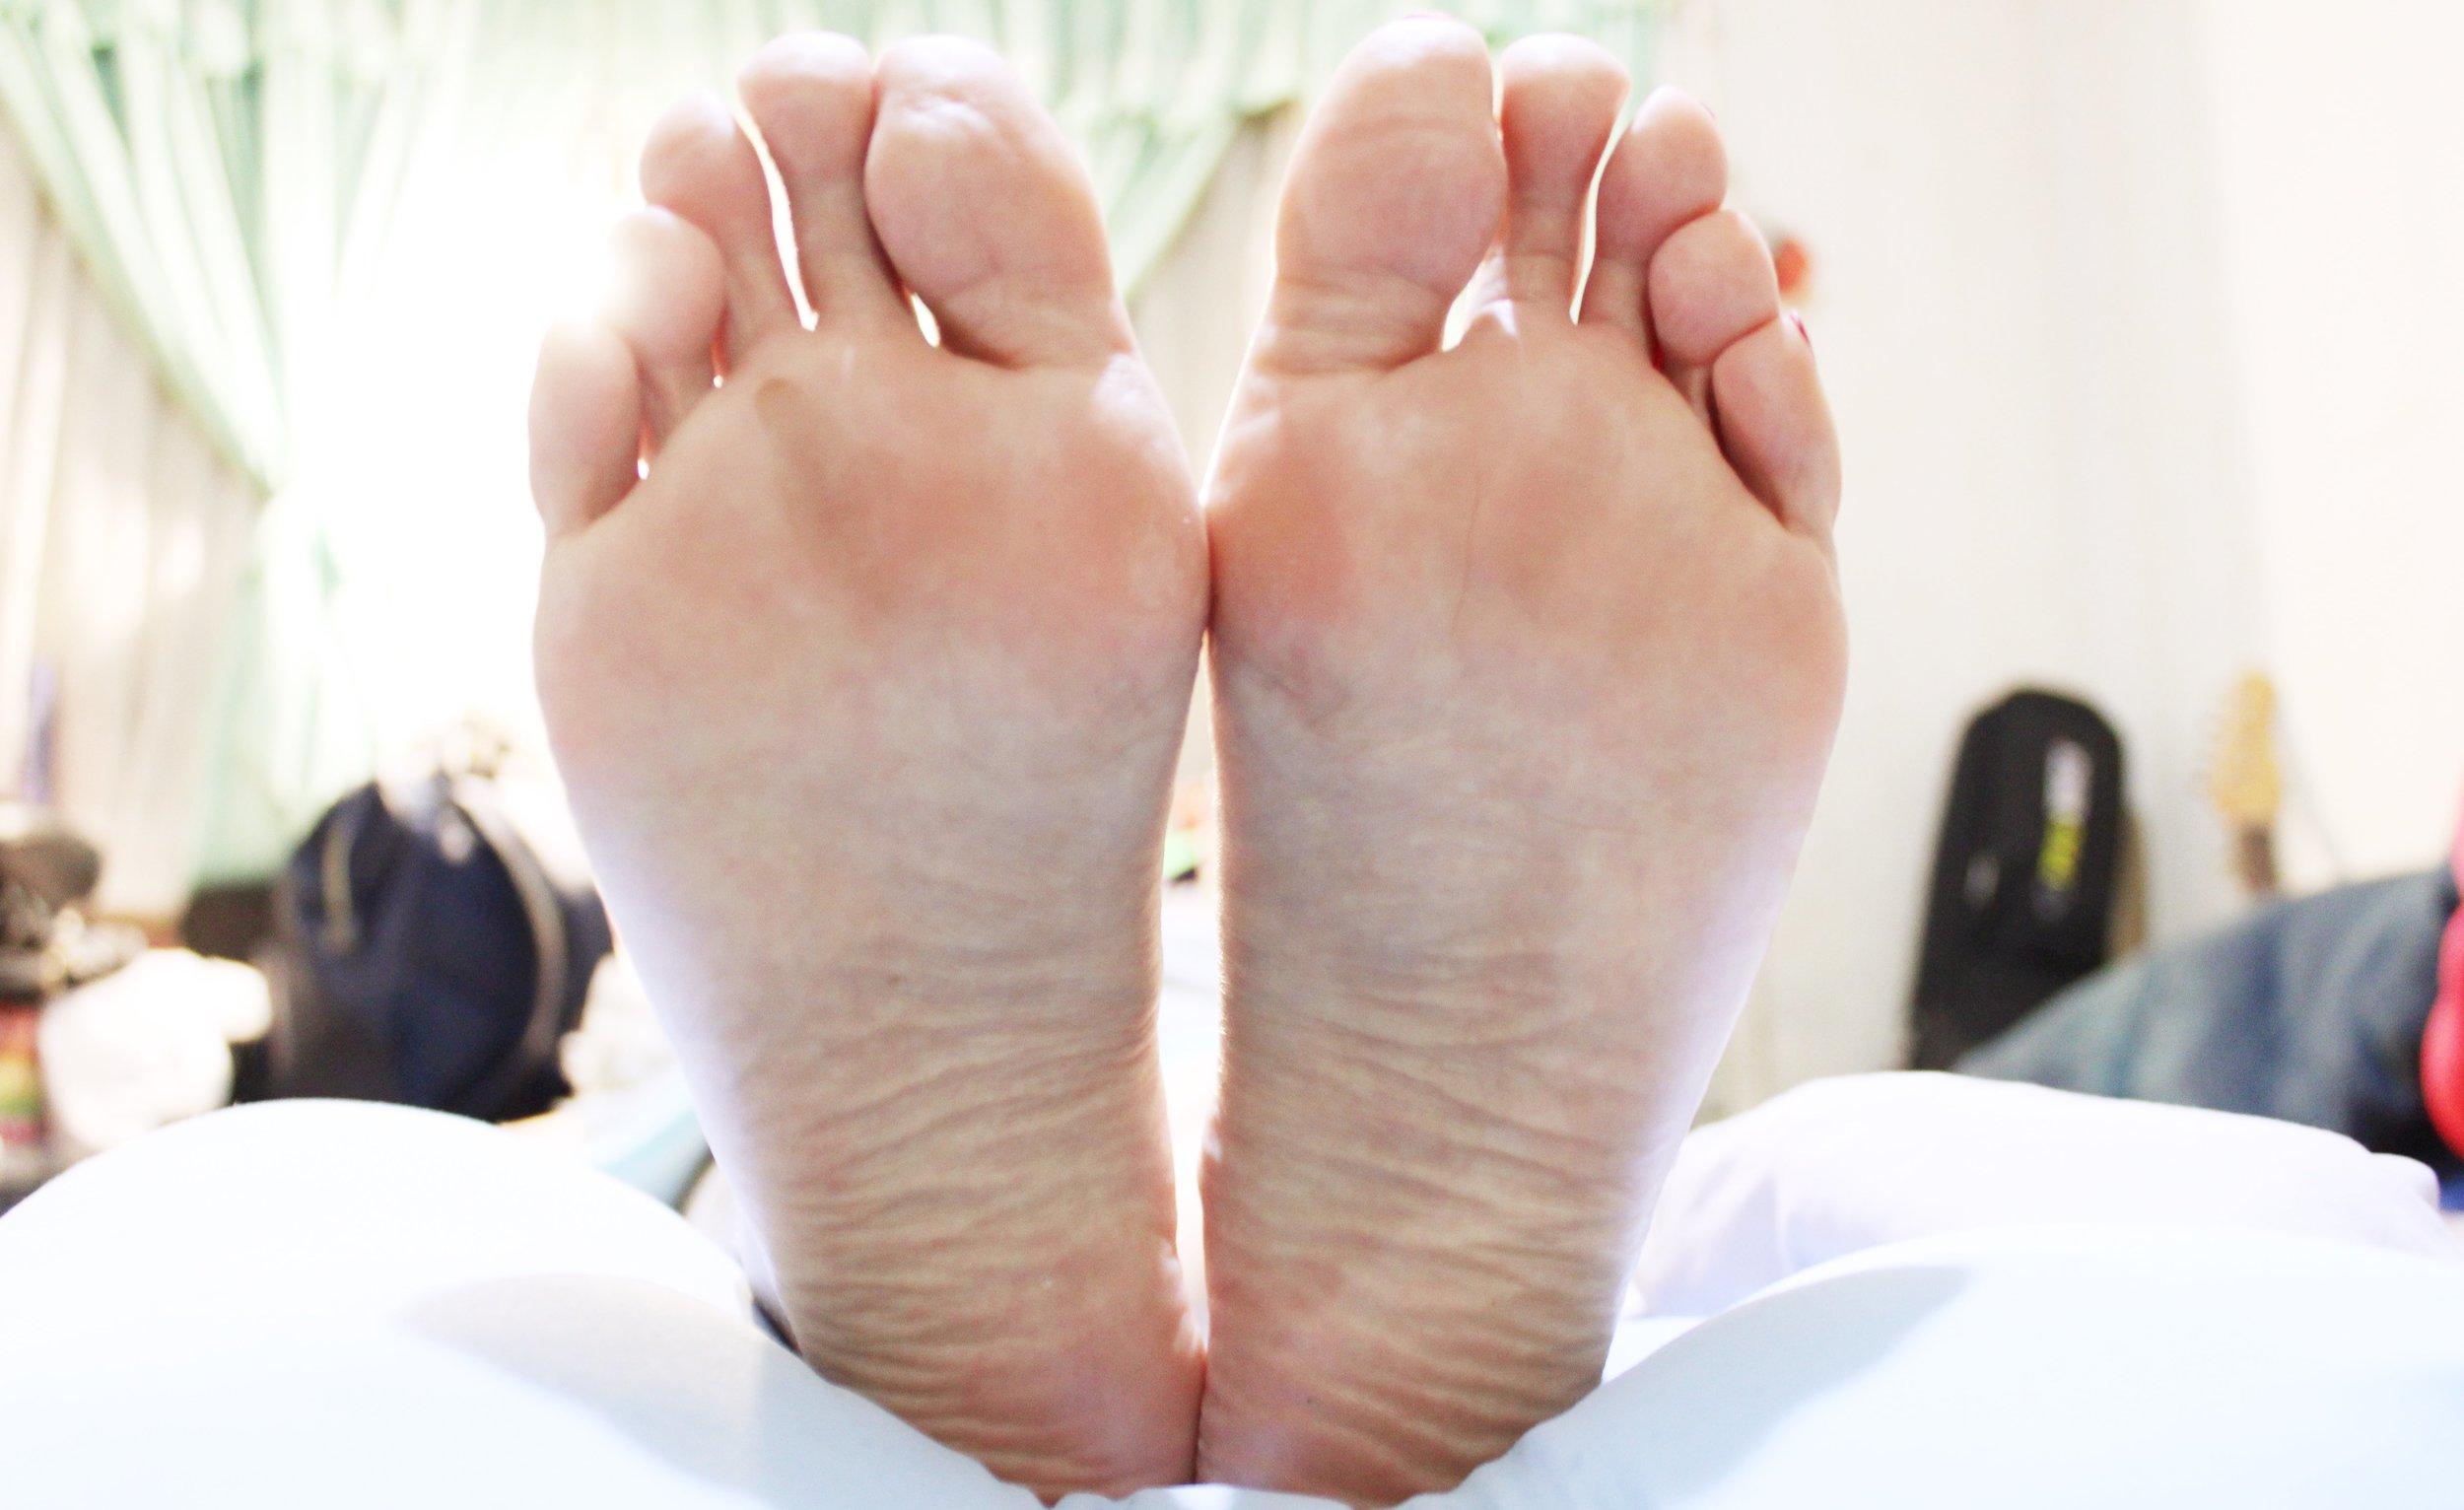 Baby feet, achieved.